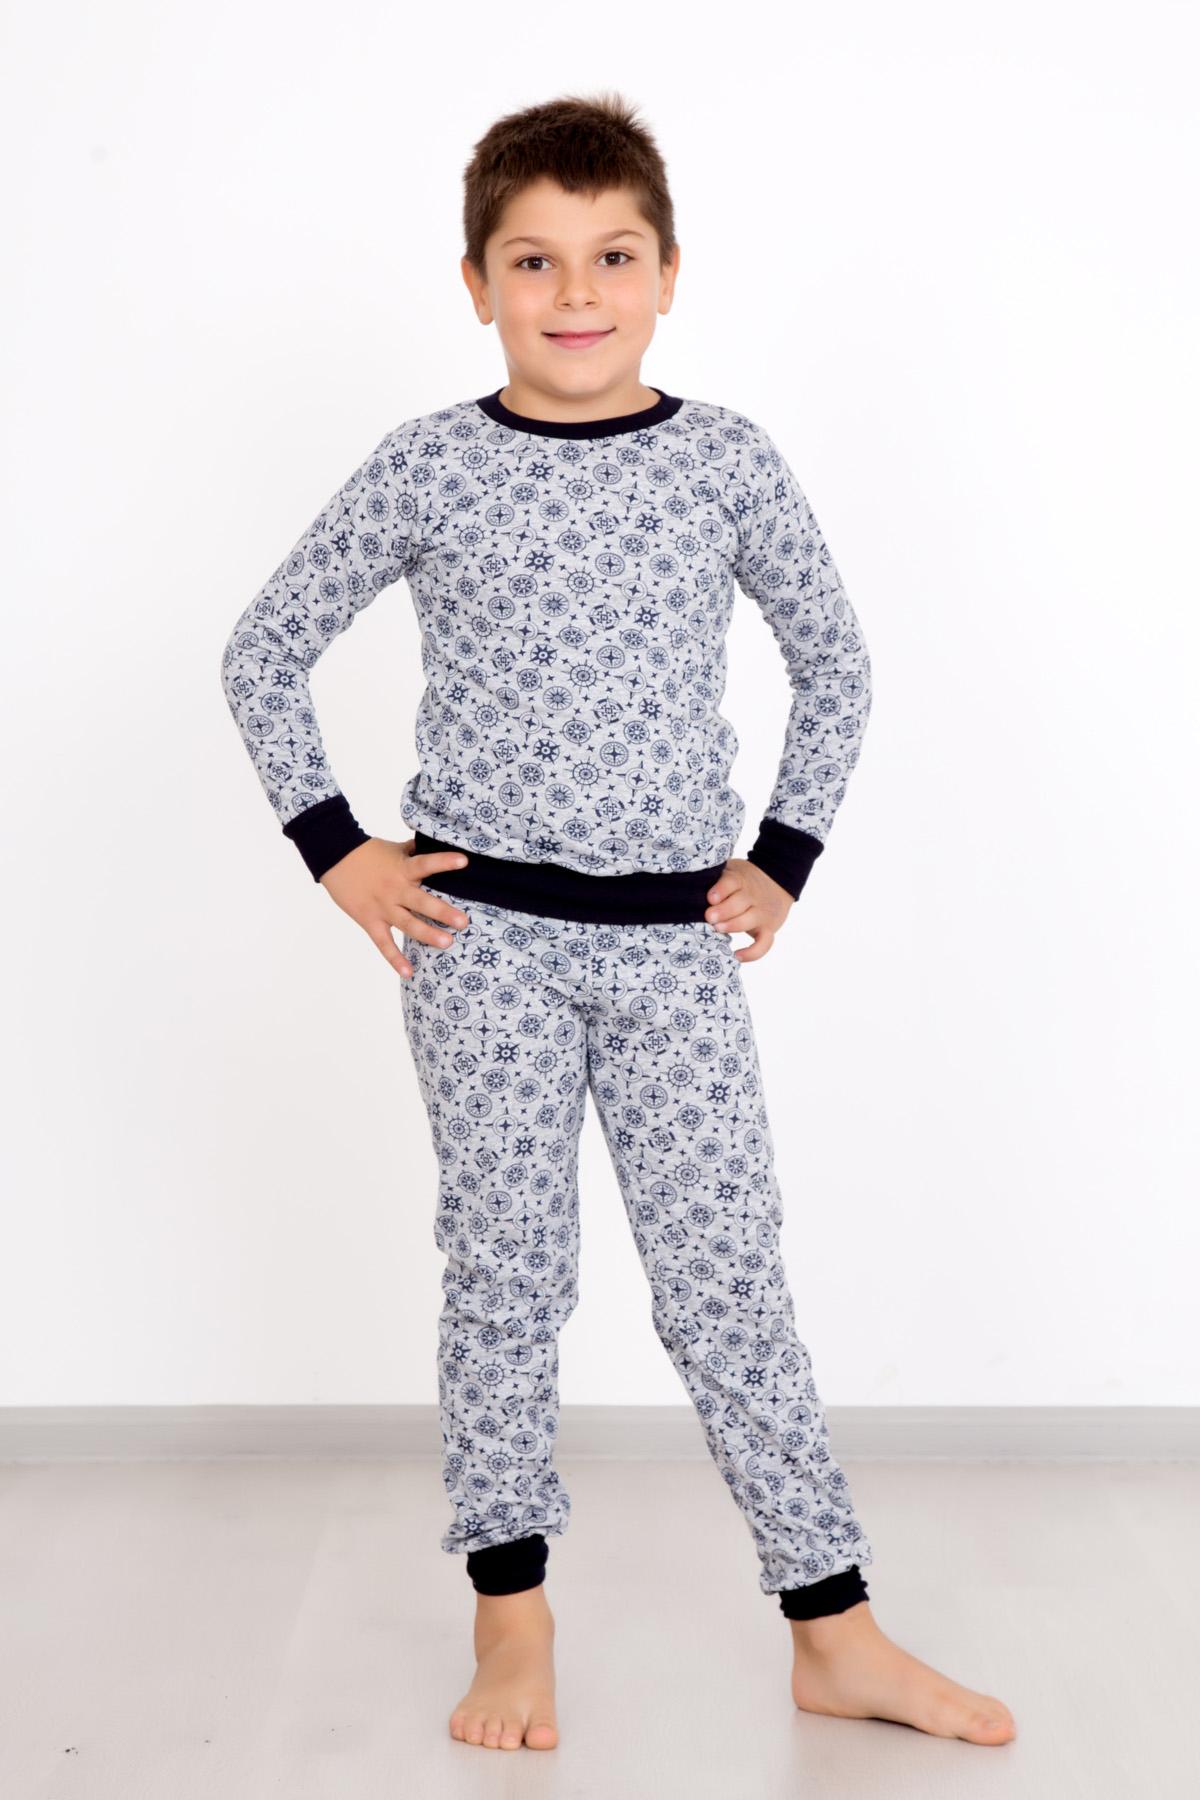 Дет. пижама Морячок р. 32Костюмы<br><br><br>Тип: Дет. пижама<br>Размер: 32<br>Материал: Кулирка